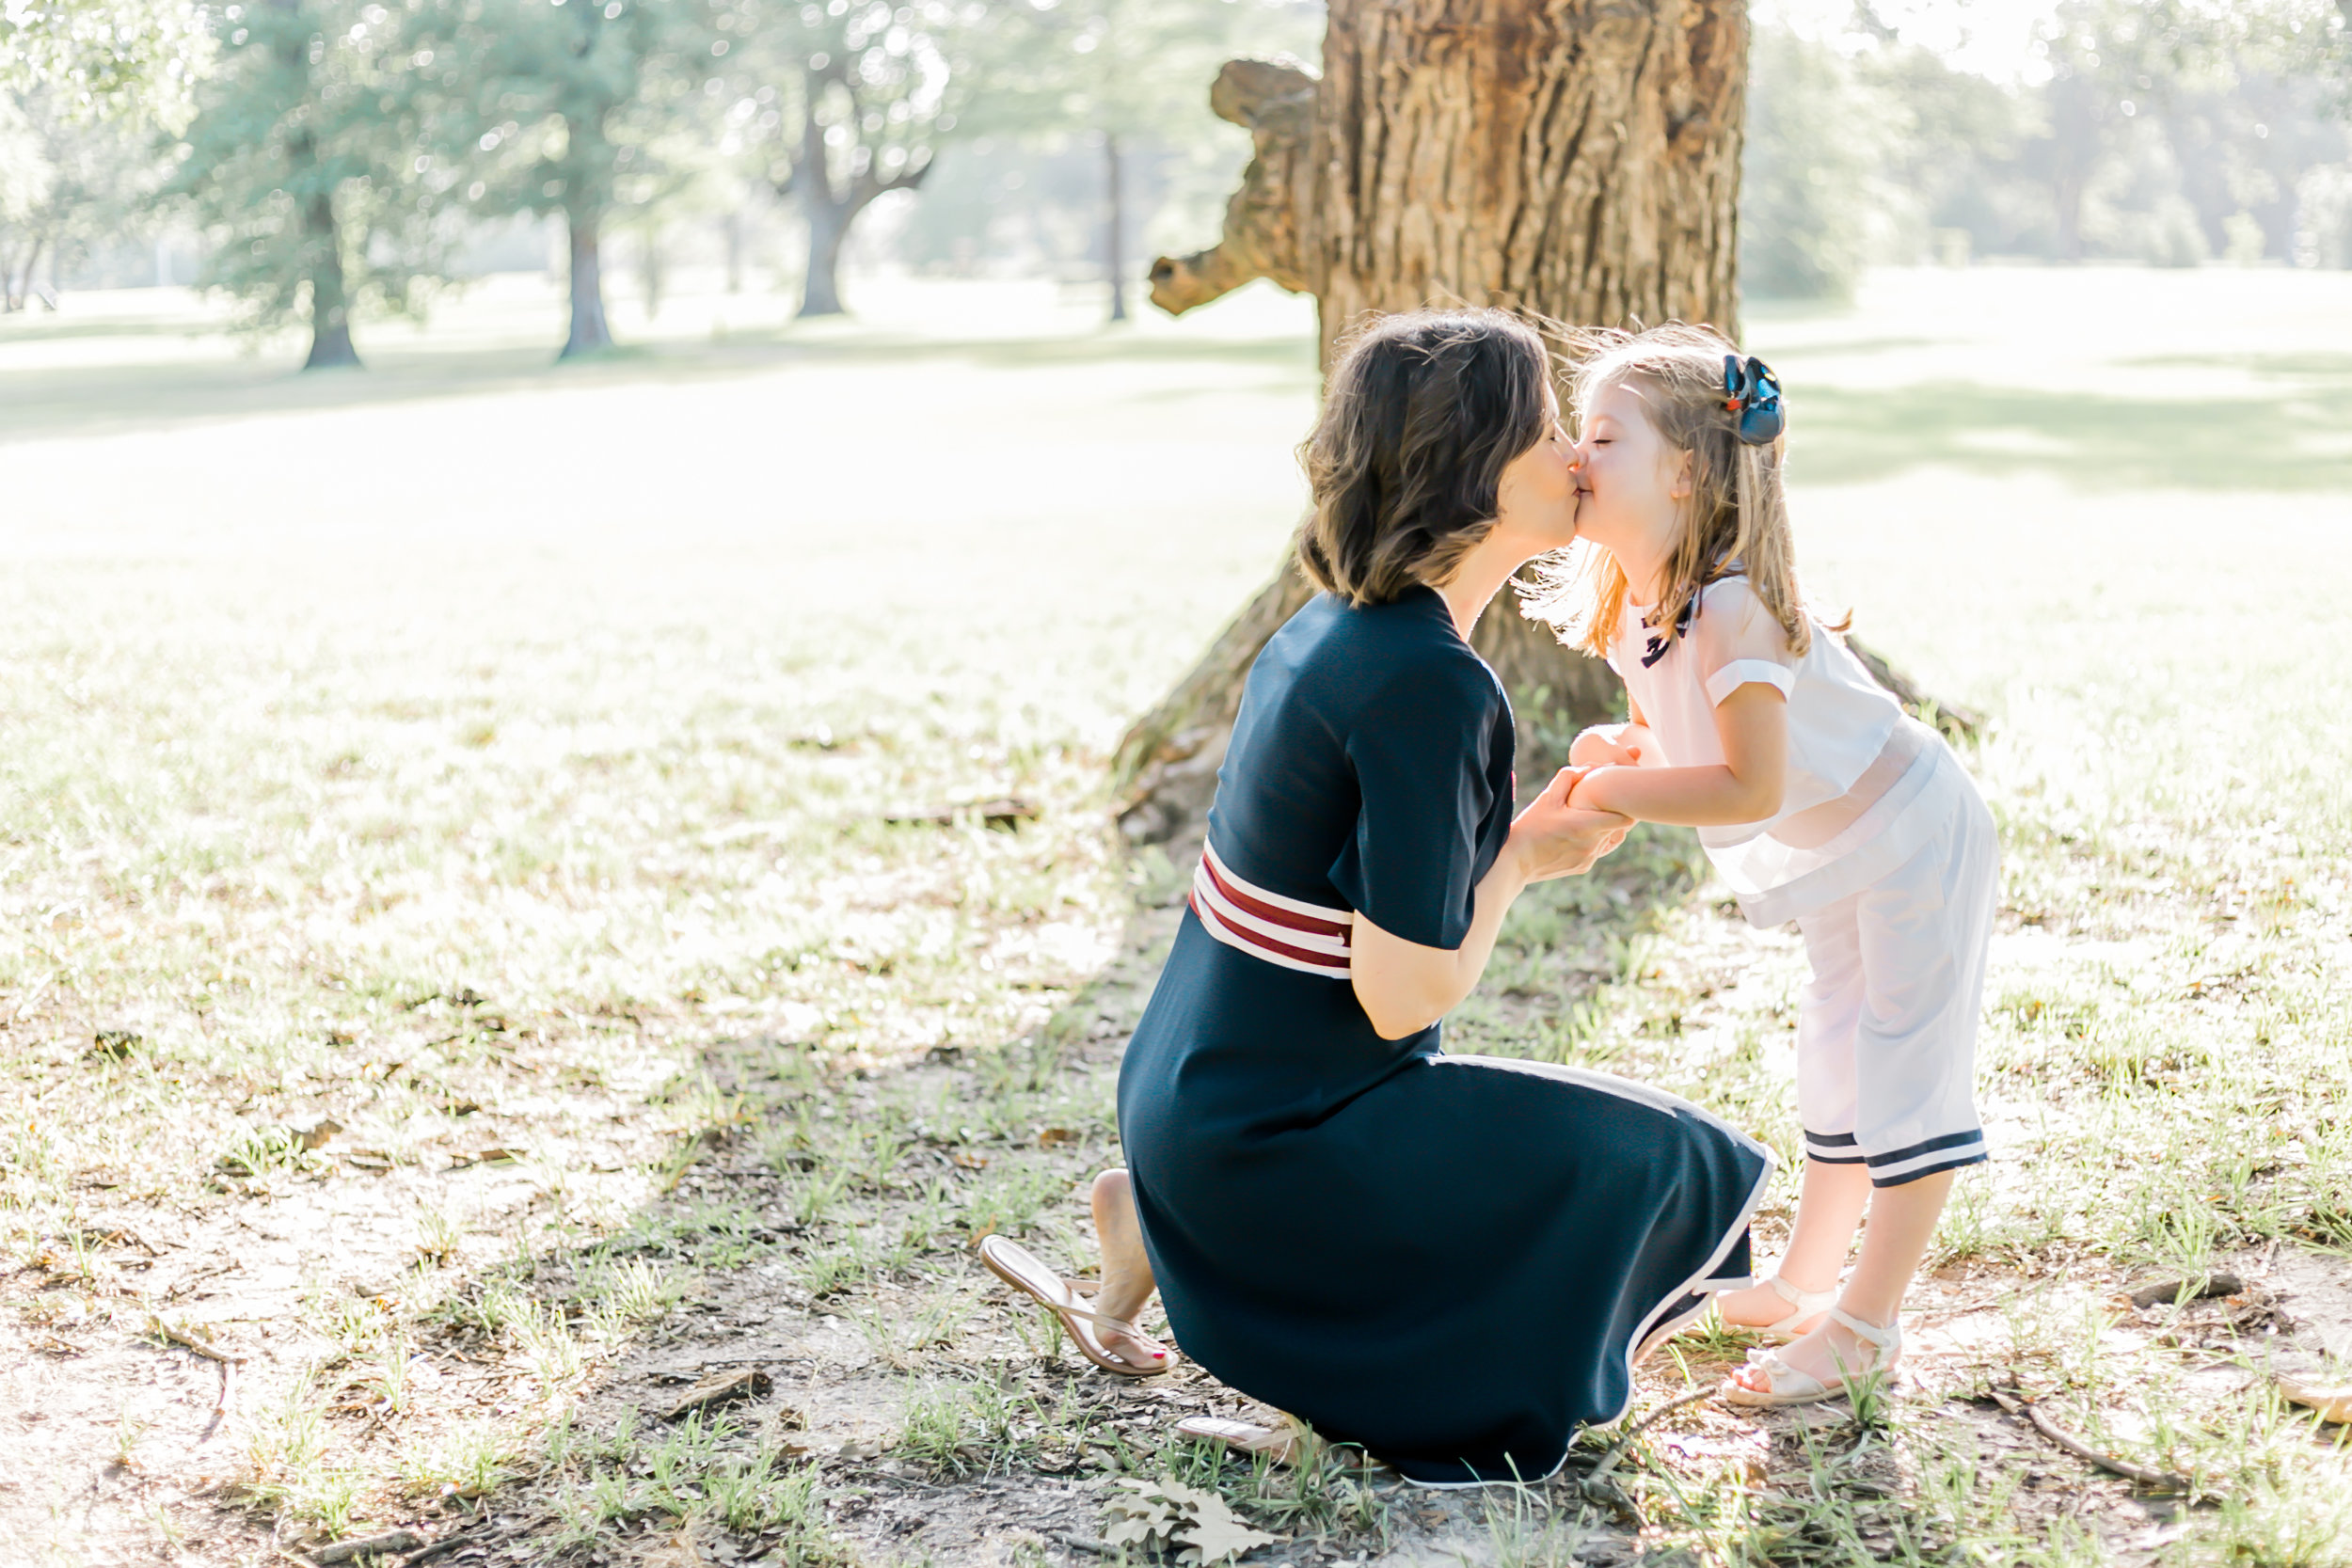 MothersDayMini-Blog-Linkenauger-4.jpg